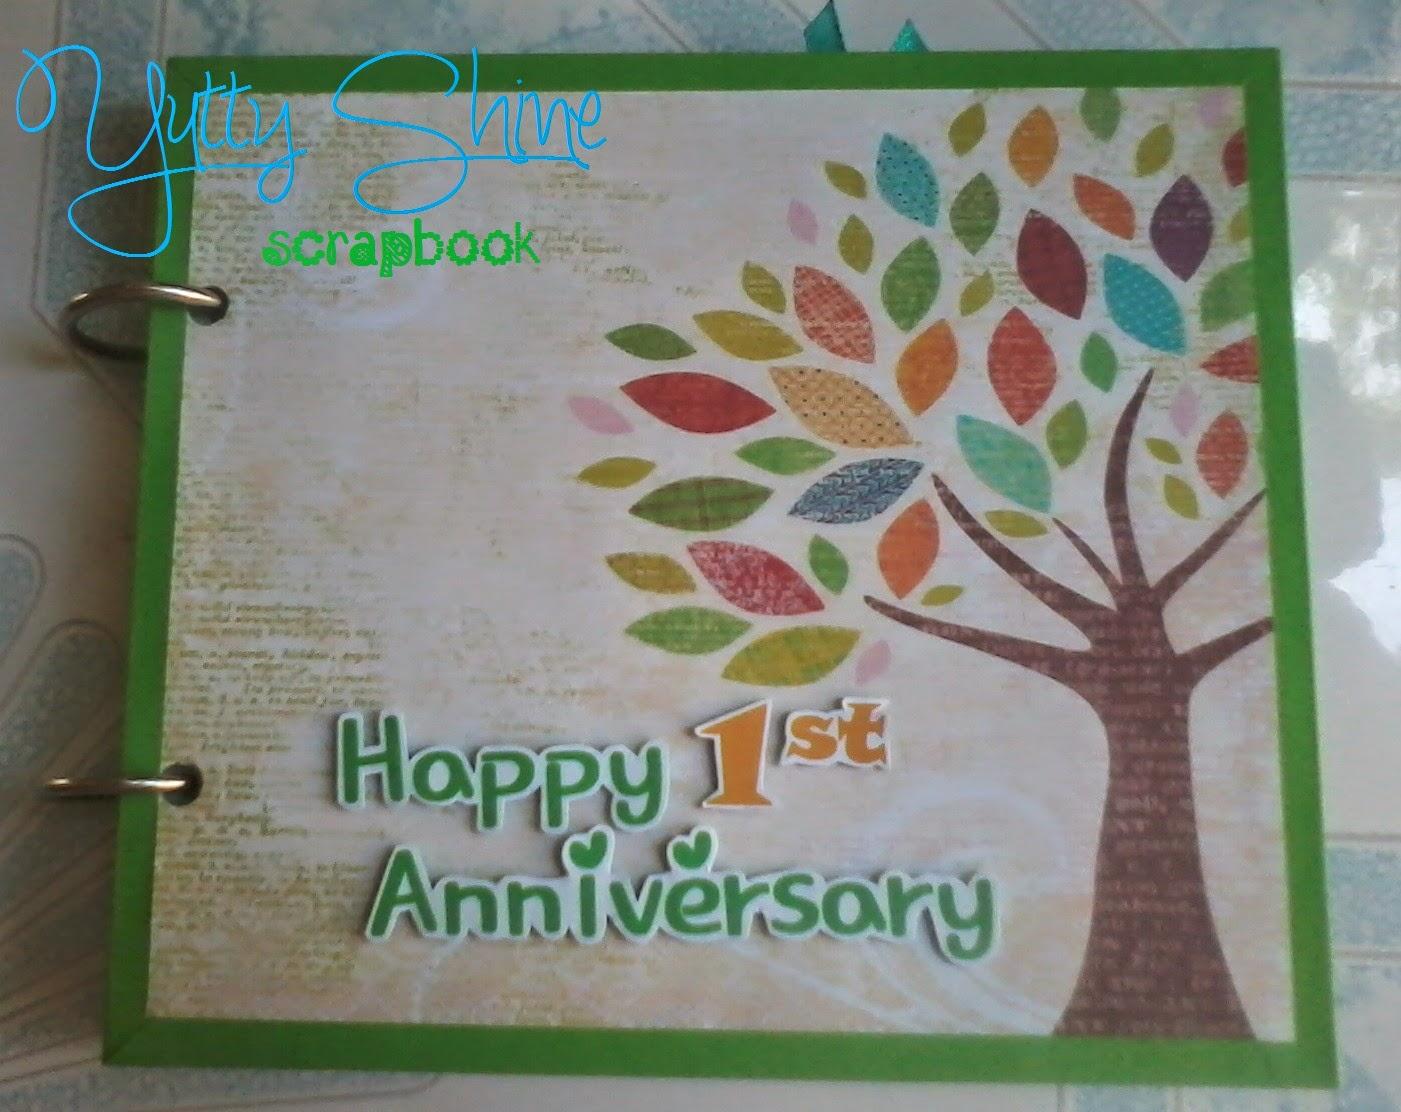 Yutty shine: happy 1st anniversary